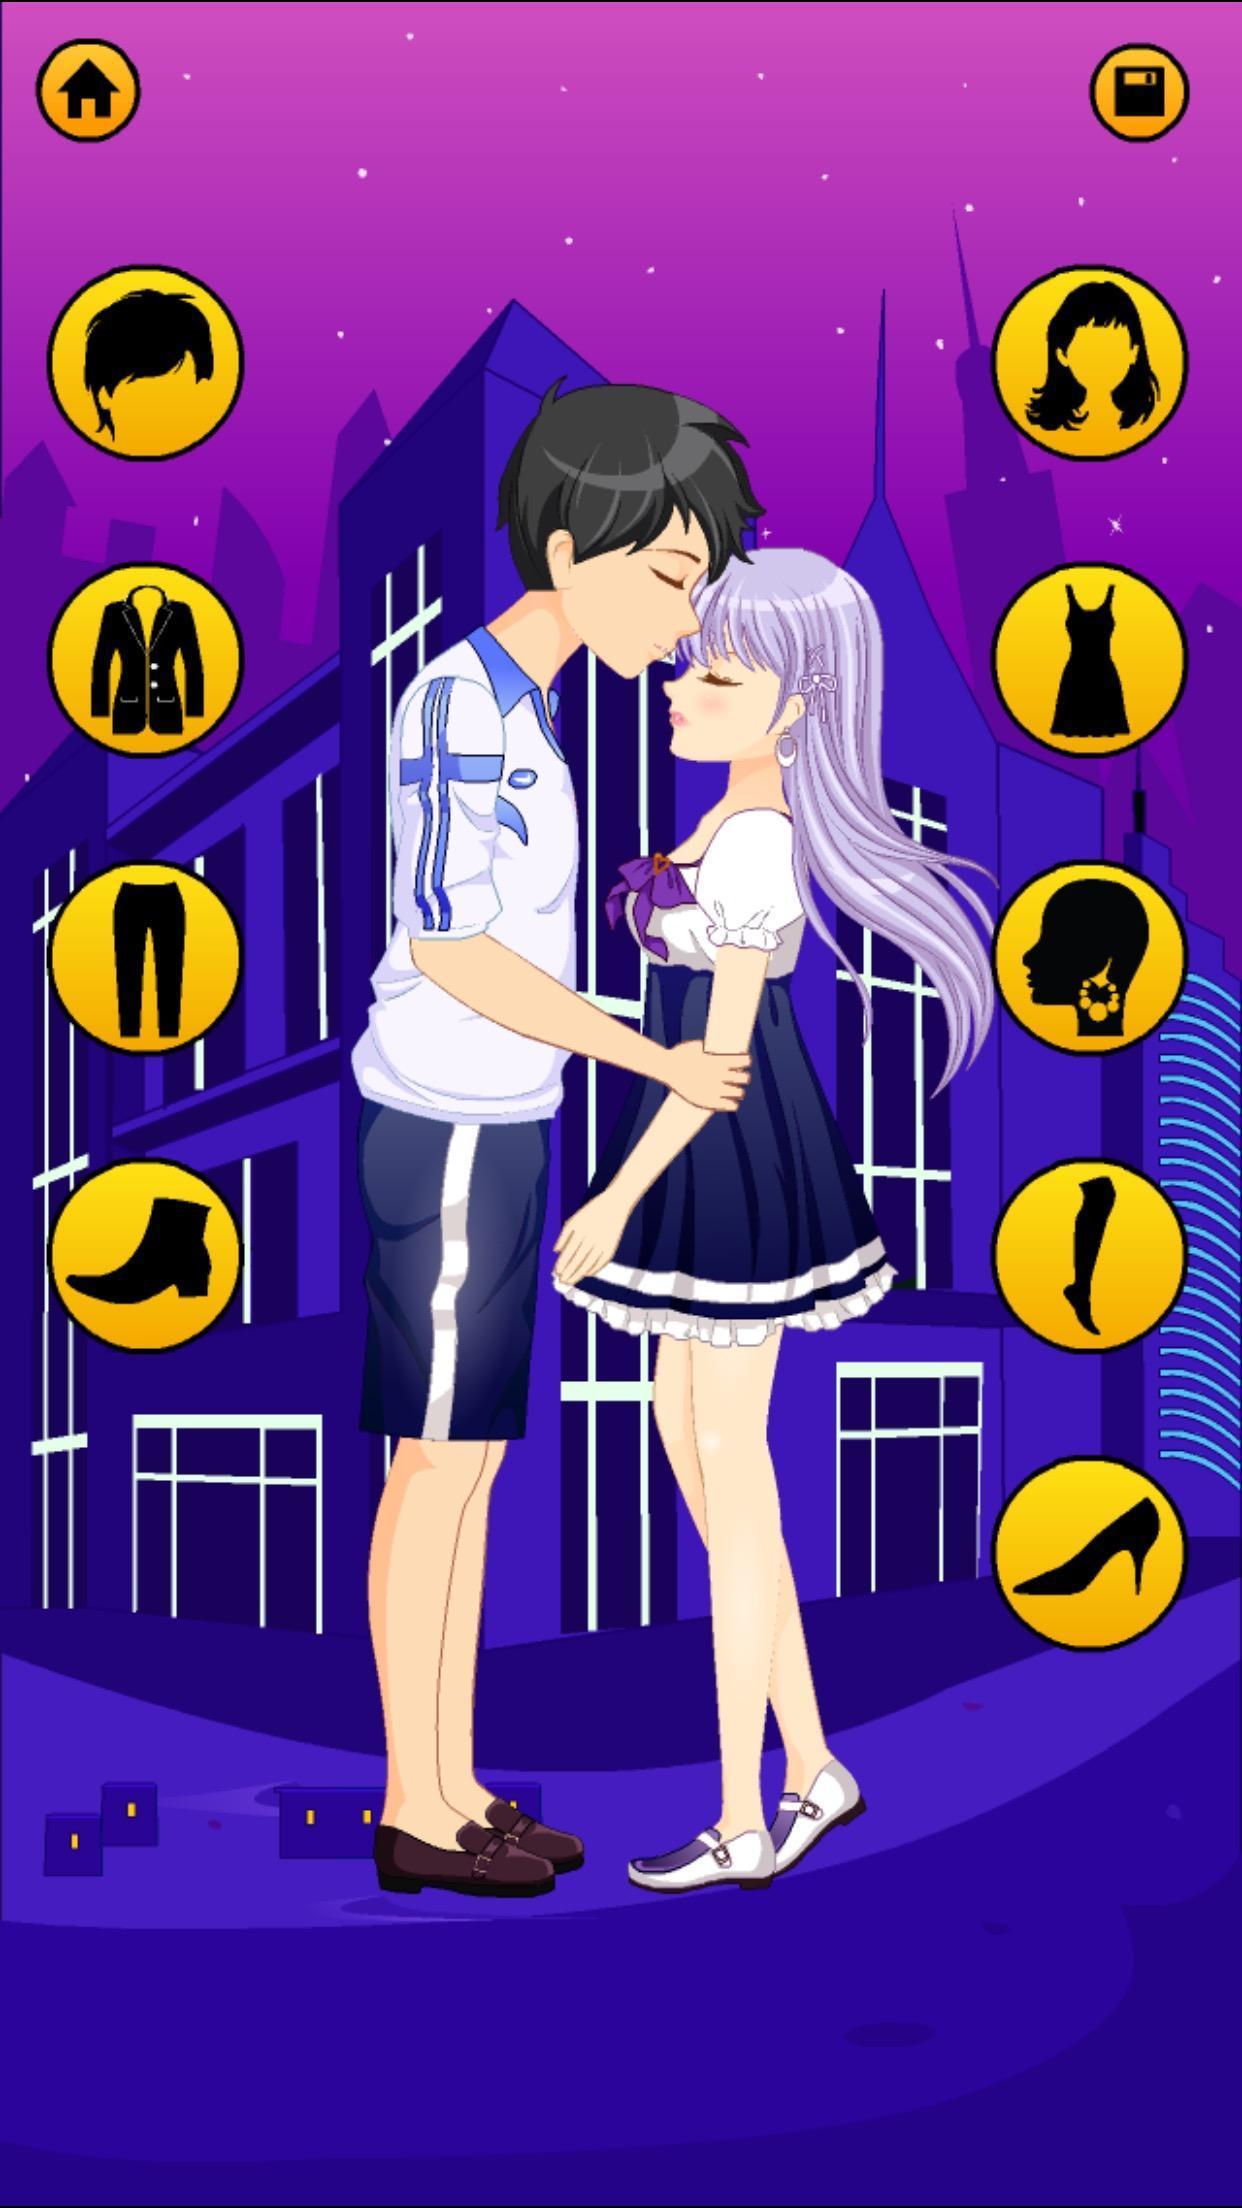 Anime Dress Up Games For Girls - Couple Love Kiss 3.3 Screenshot 13